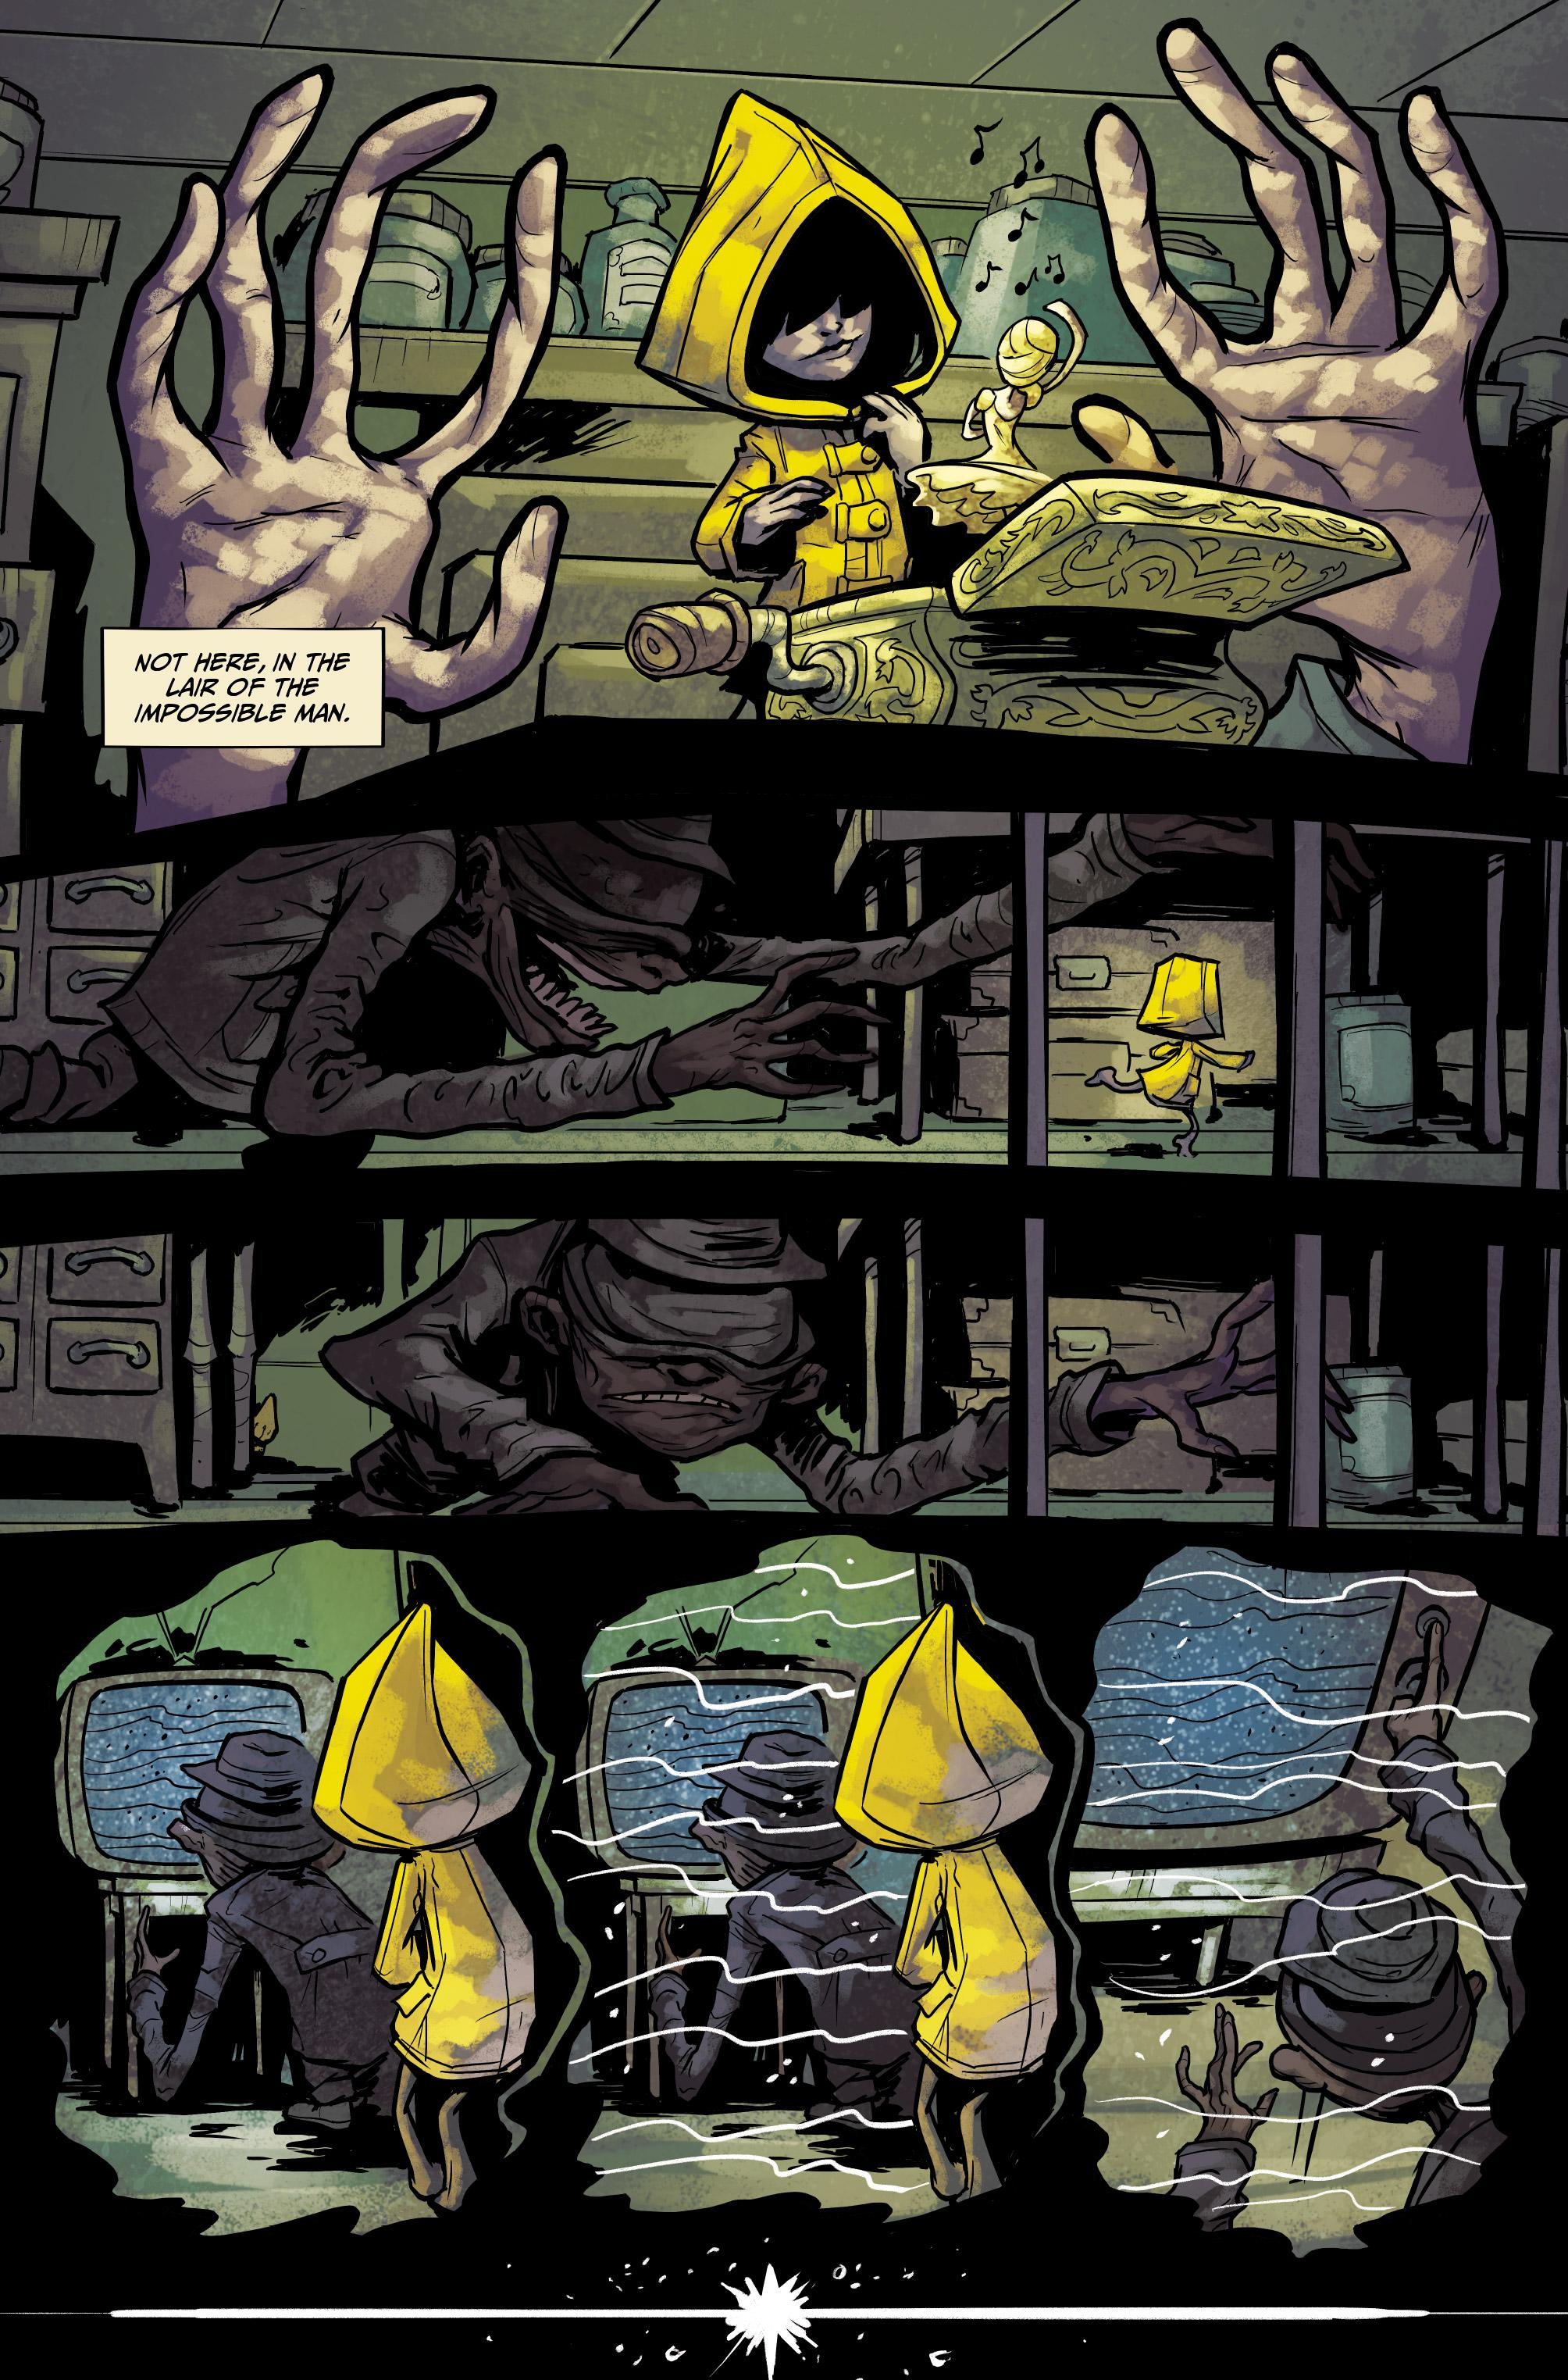 Read online Little Nightmares comic -  Issue #1 - 8